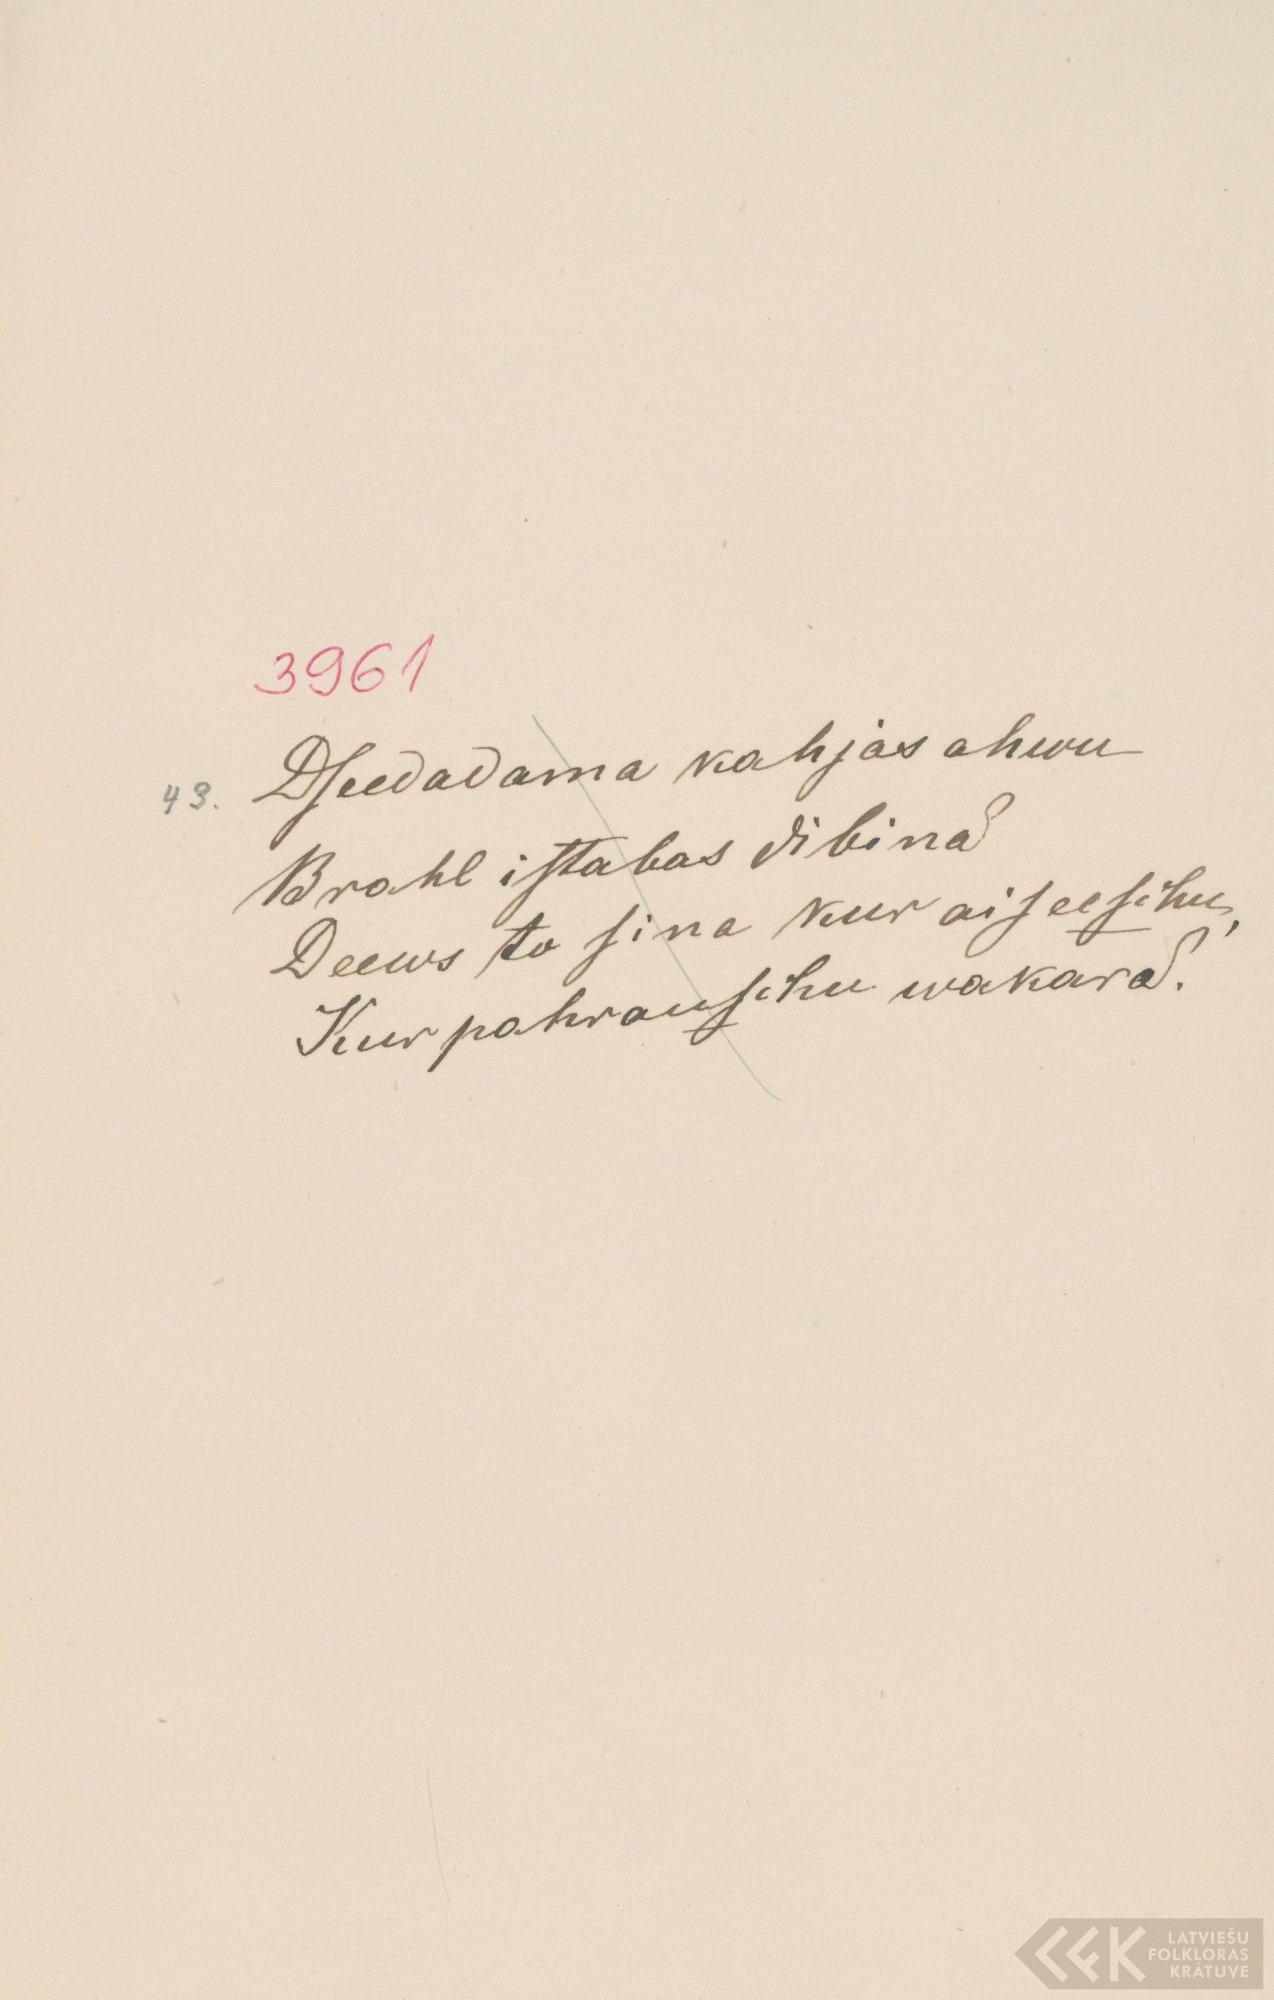 1620-Krisjana-Barona-krajums-07-0179